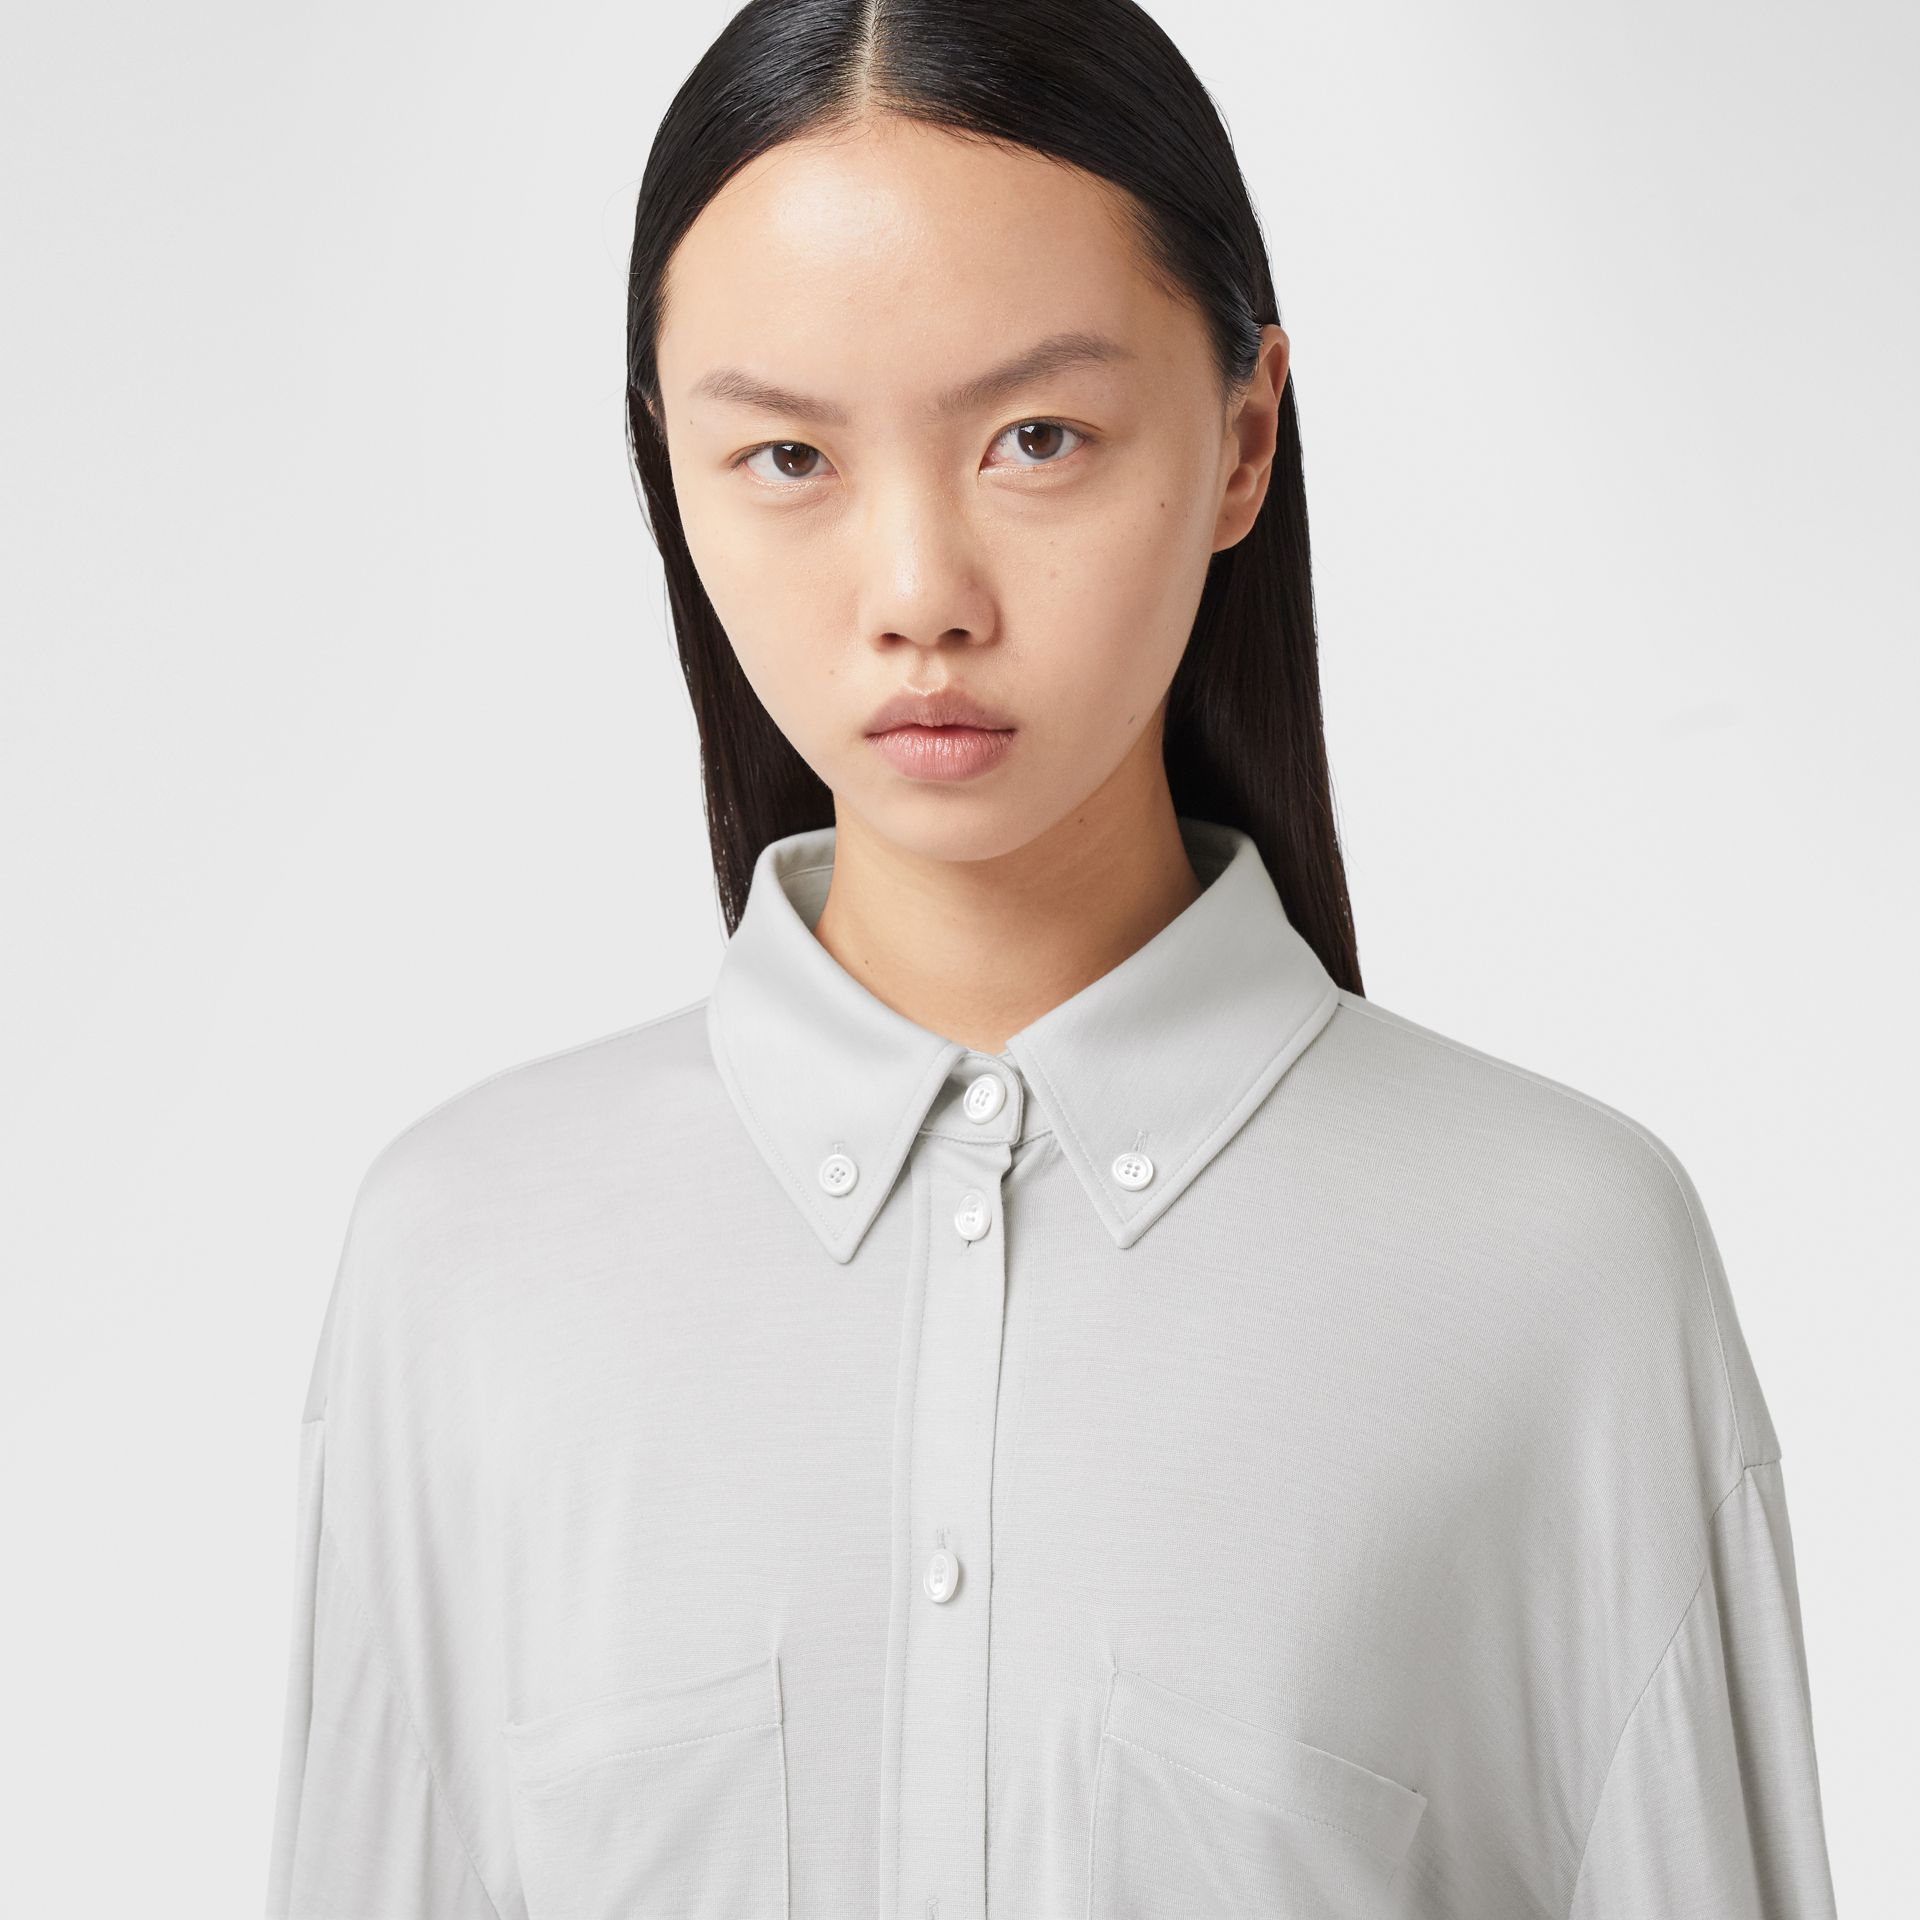 Fringed Silk Wool Jersey Shirt in Grey Melange - Women | Burberry Canada - gallery image 1